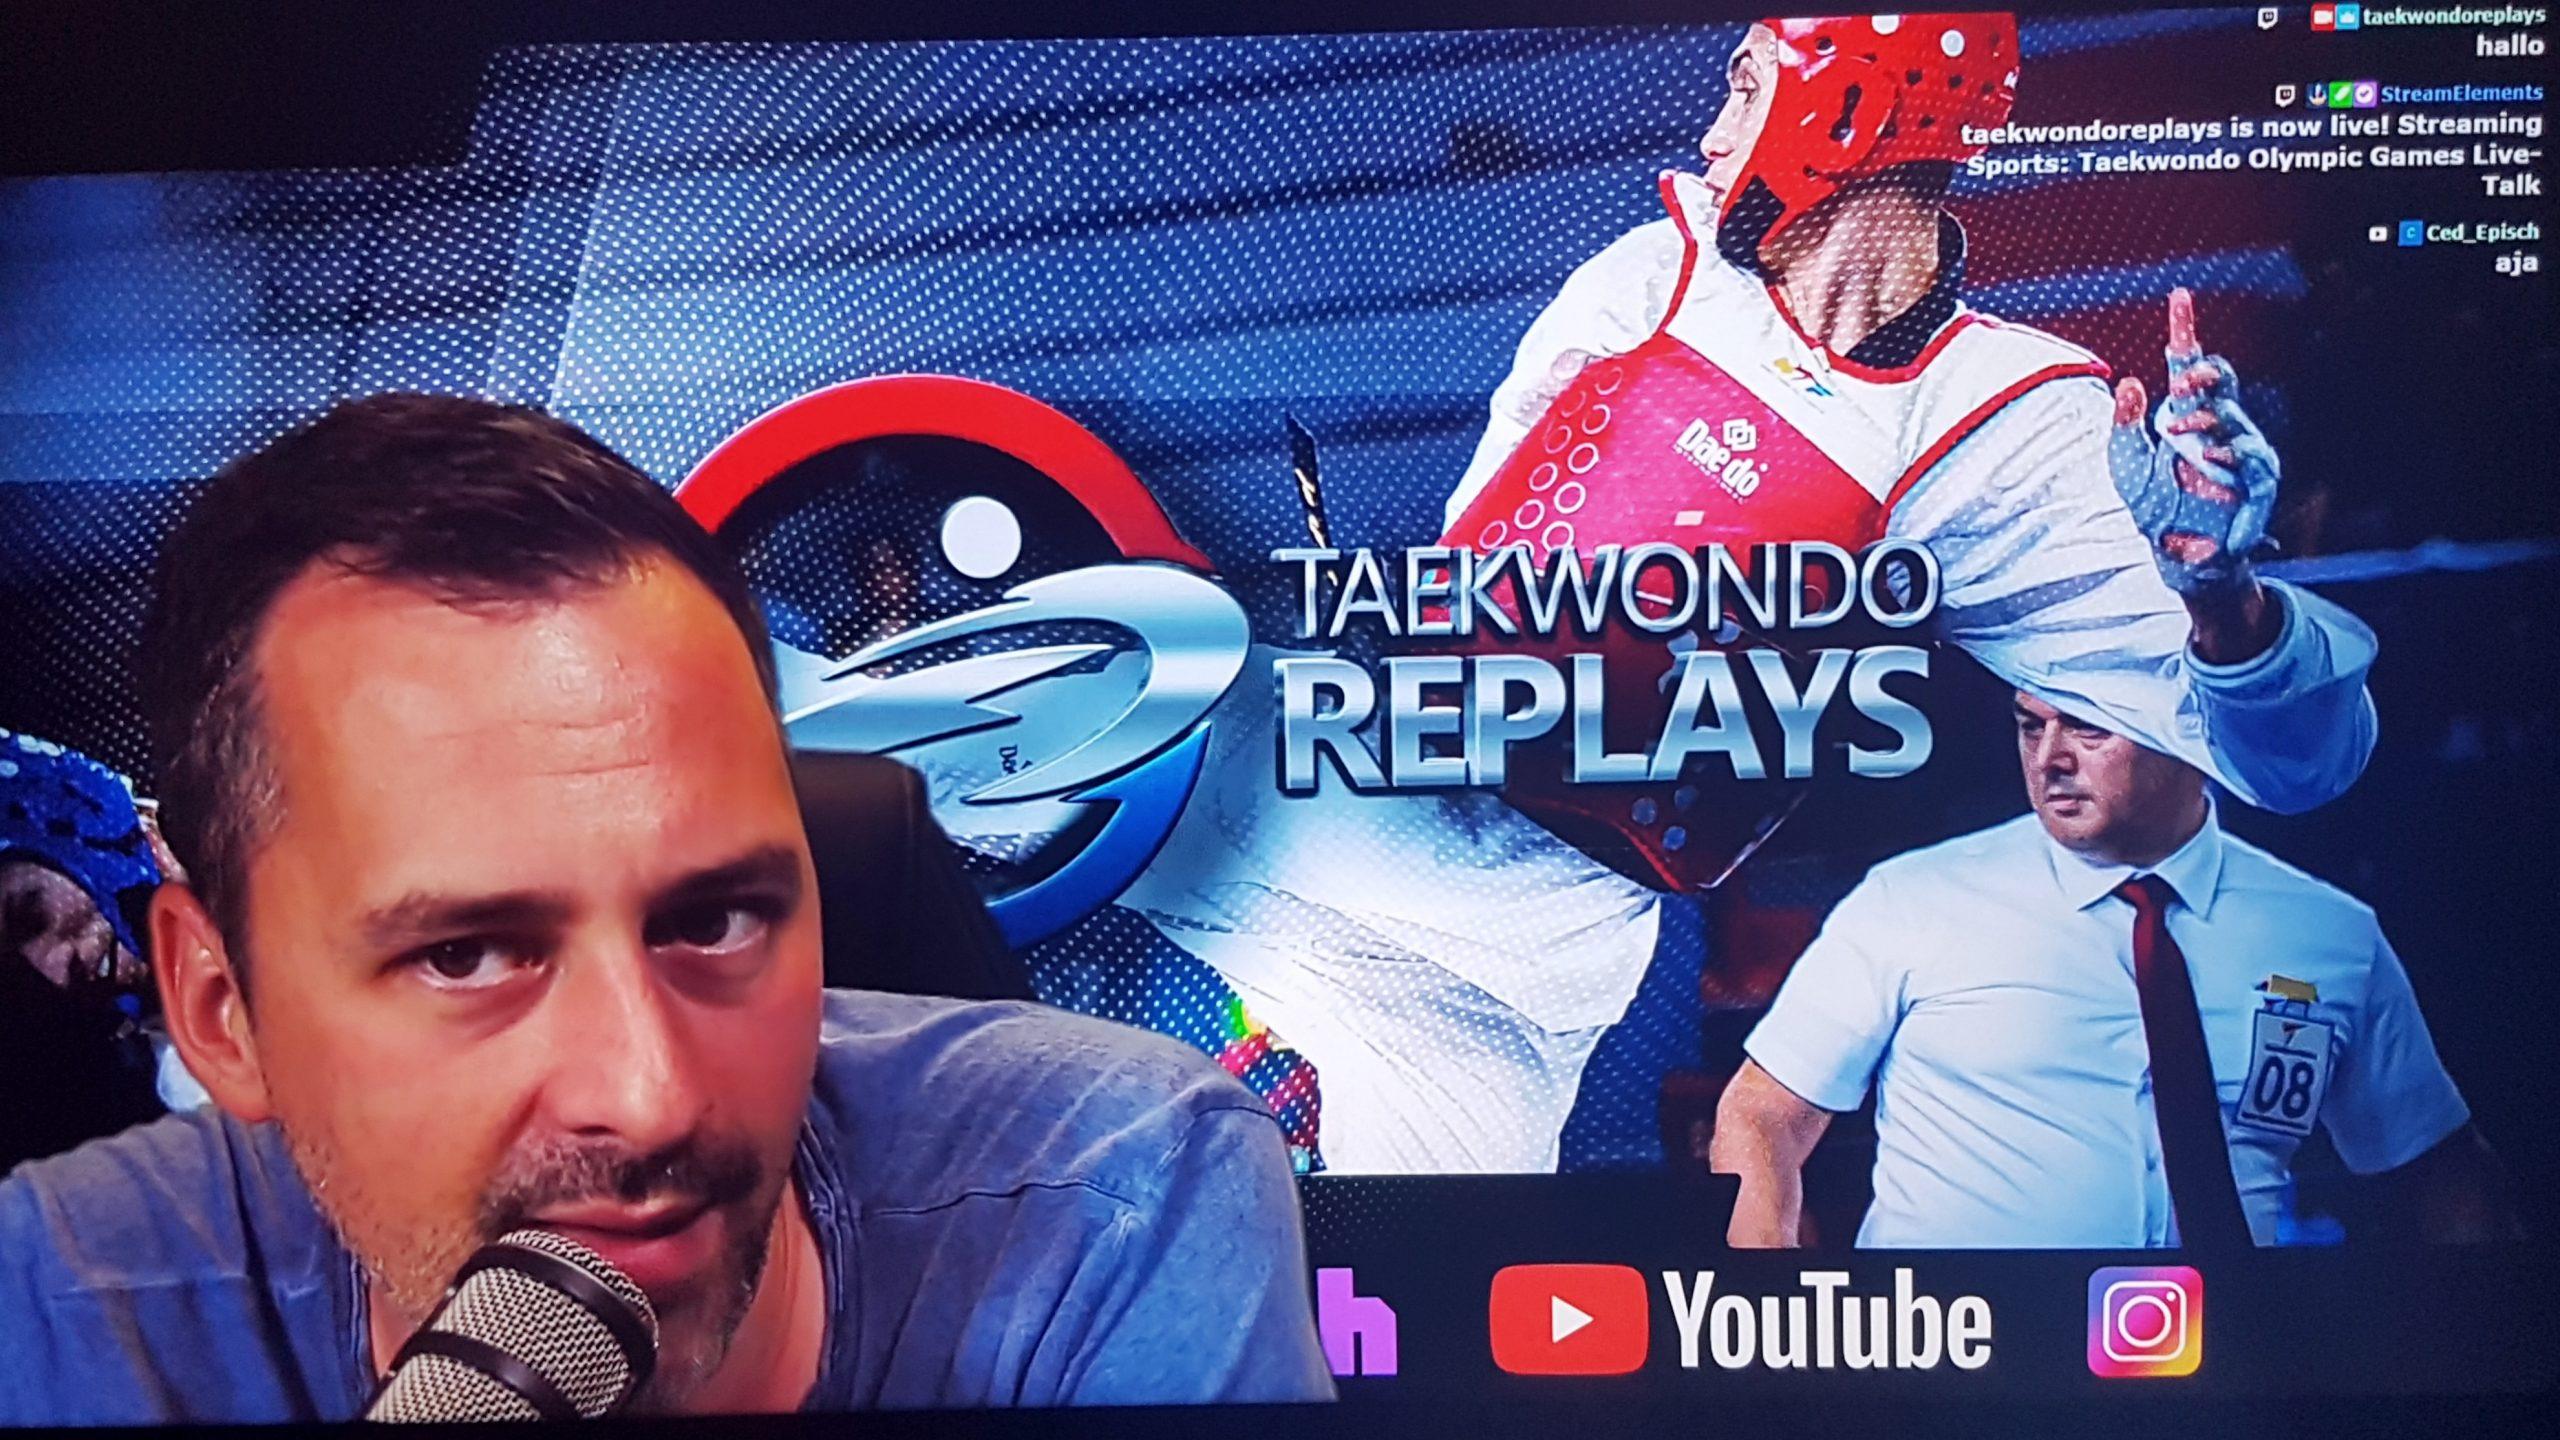 Foto: Benjamin Güntner, Taekwondo Replays, YouTube